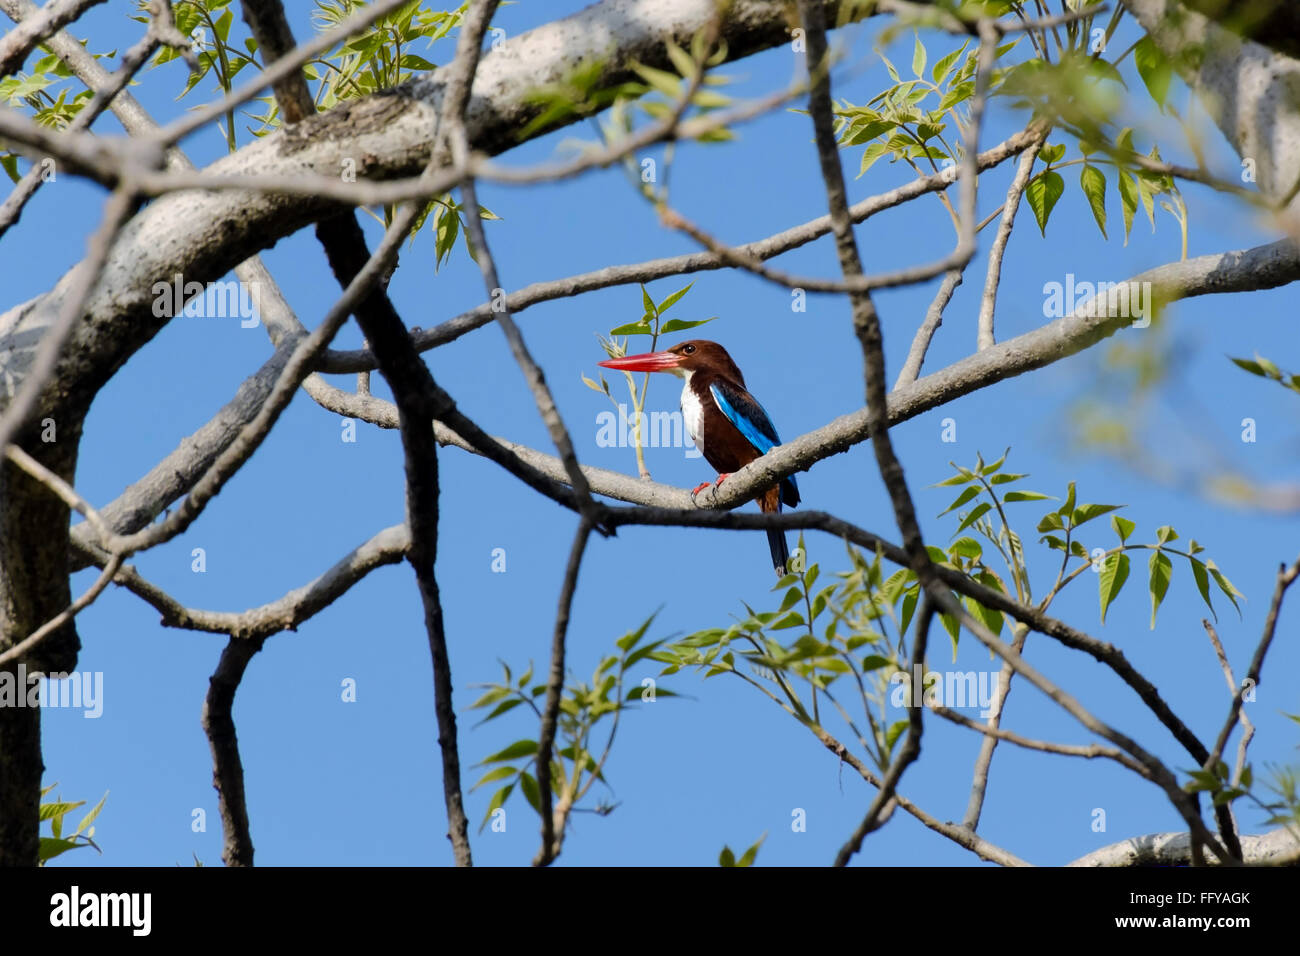 white breasted kingfisher on tree bandhavgarh national park madhya pradesh India - Stock Image